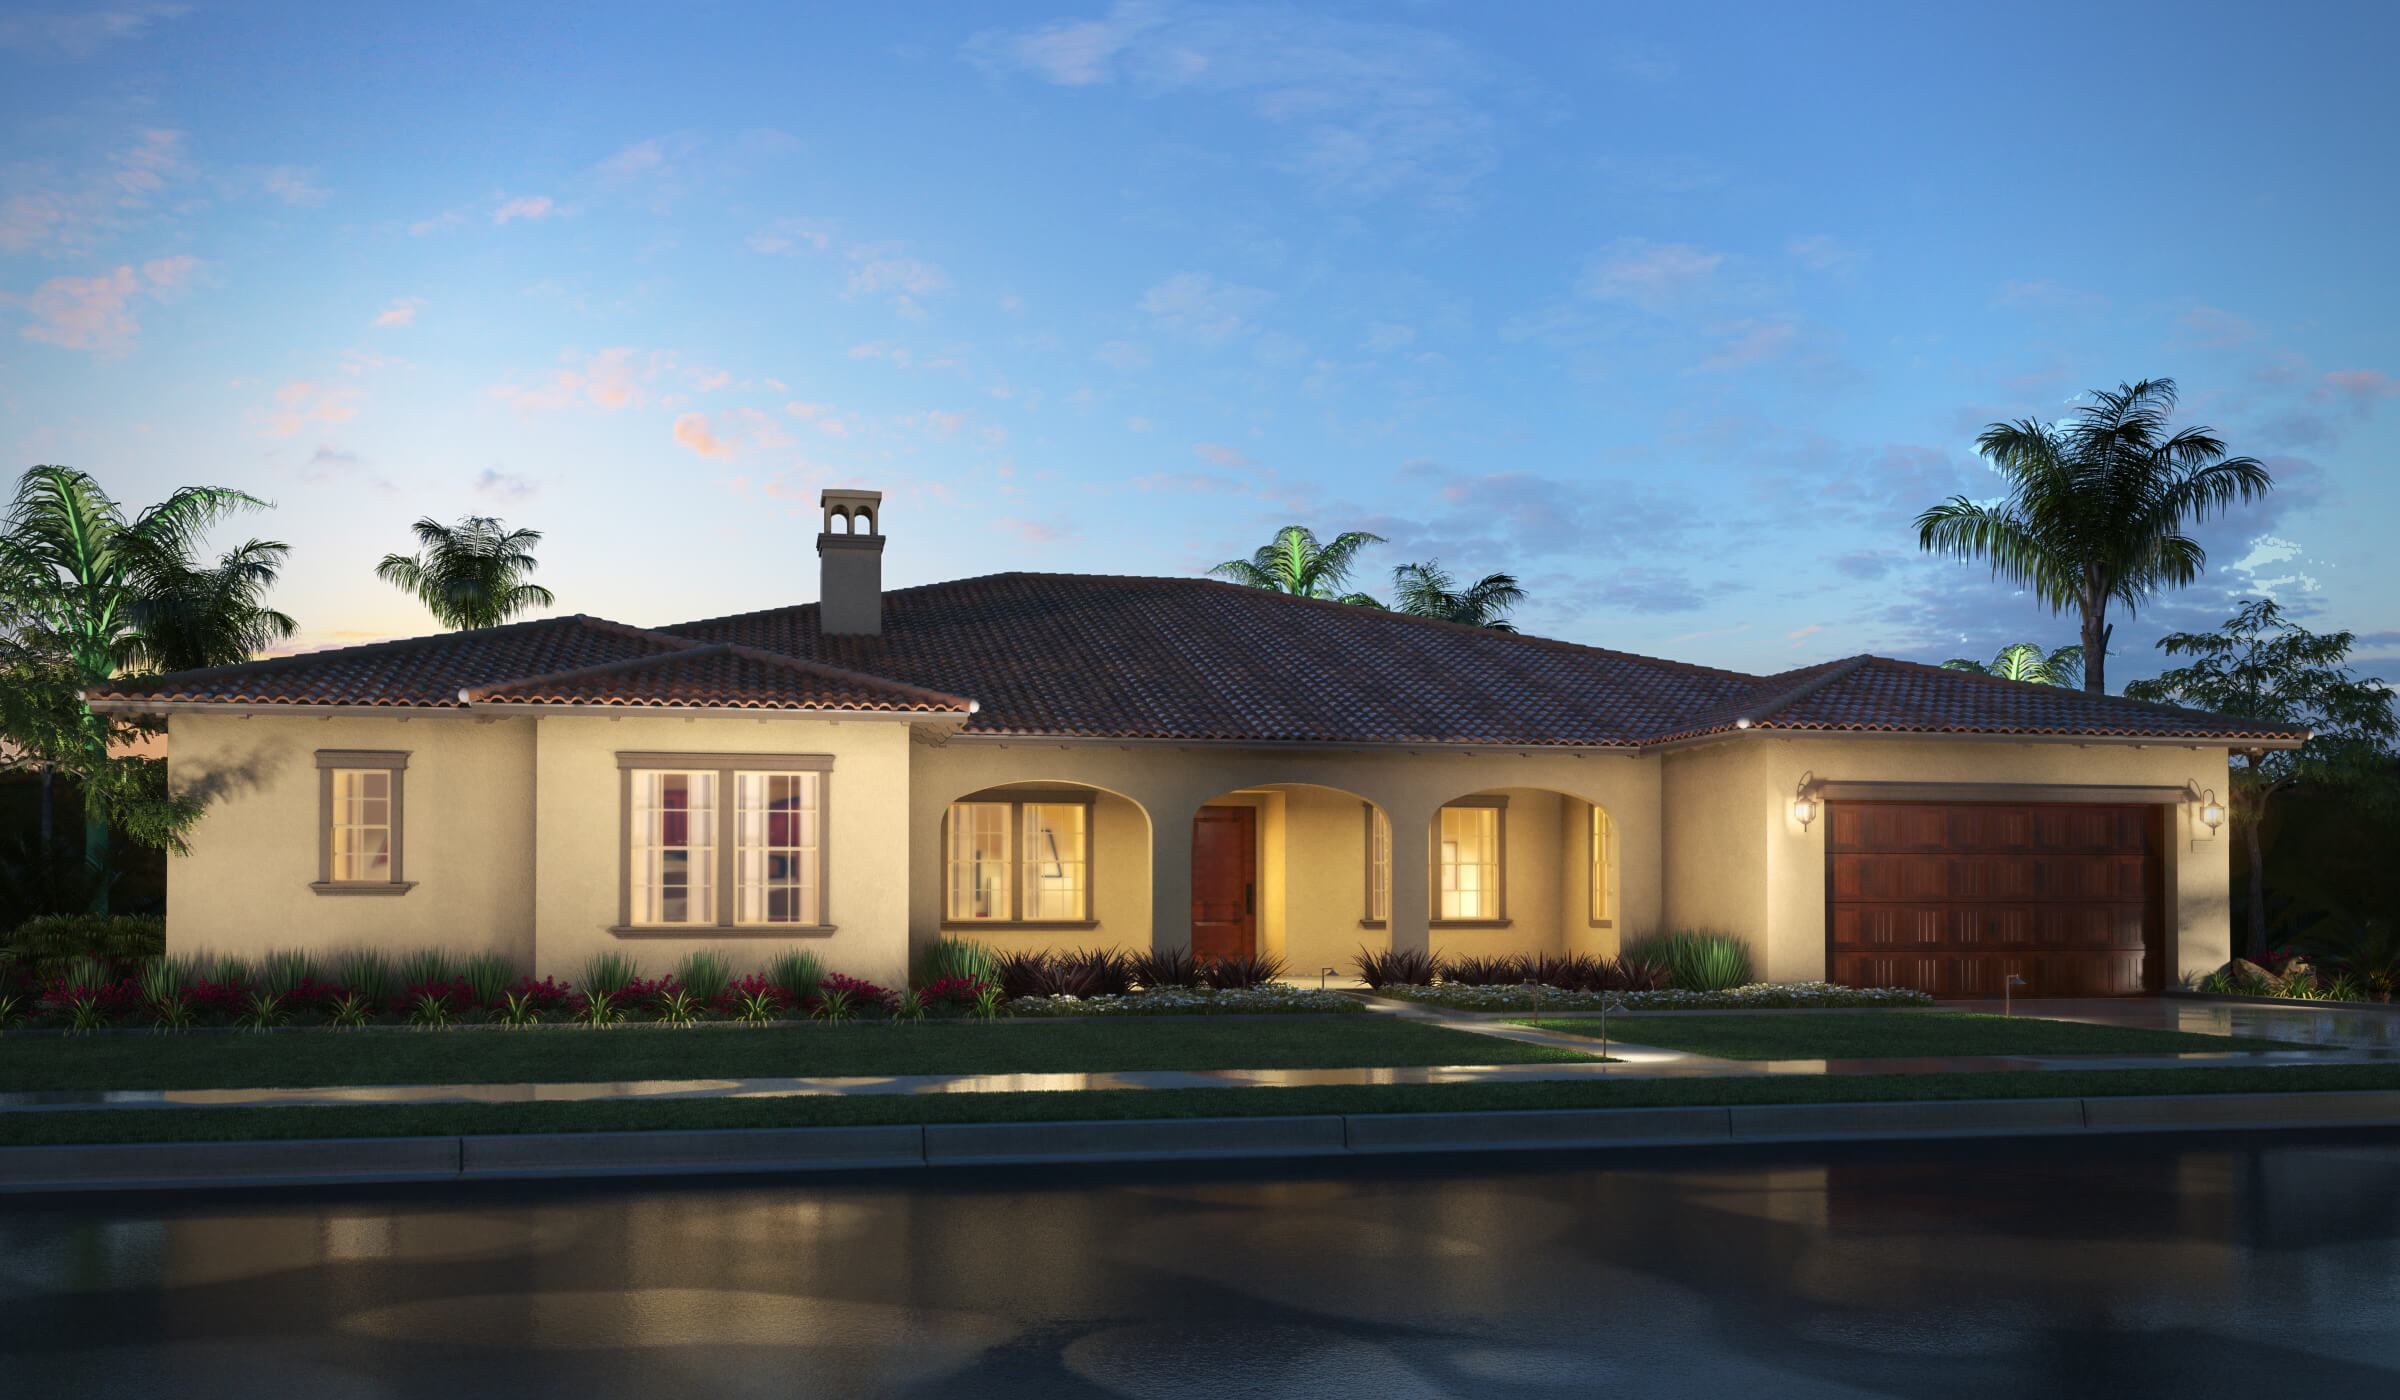 Single Family for Sale at La Colina Estates - Residence 4 1203 Iris Lane Glendora, California 91741 United States